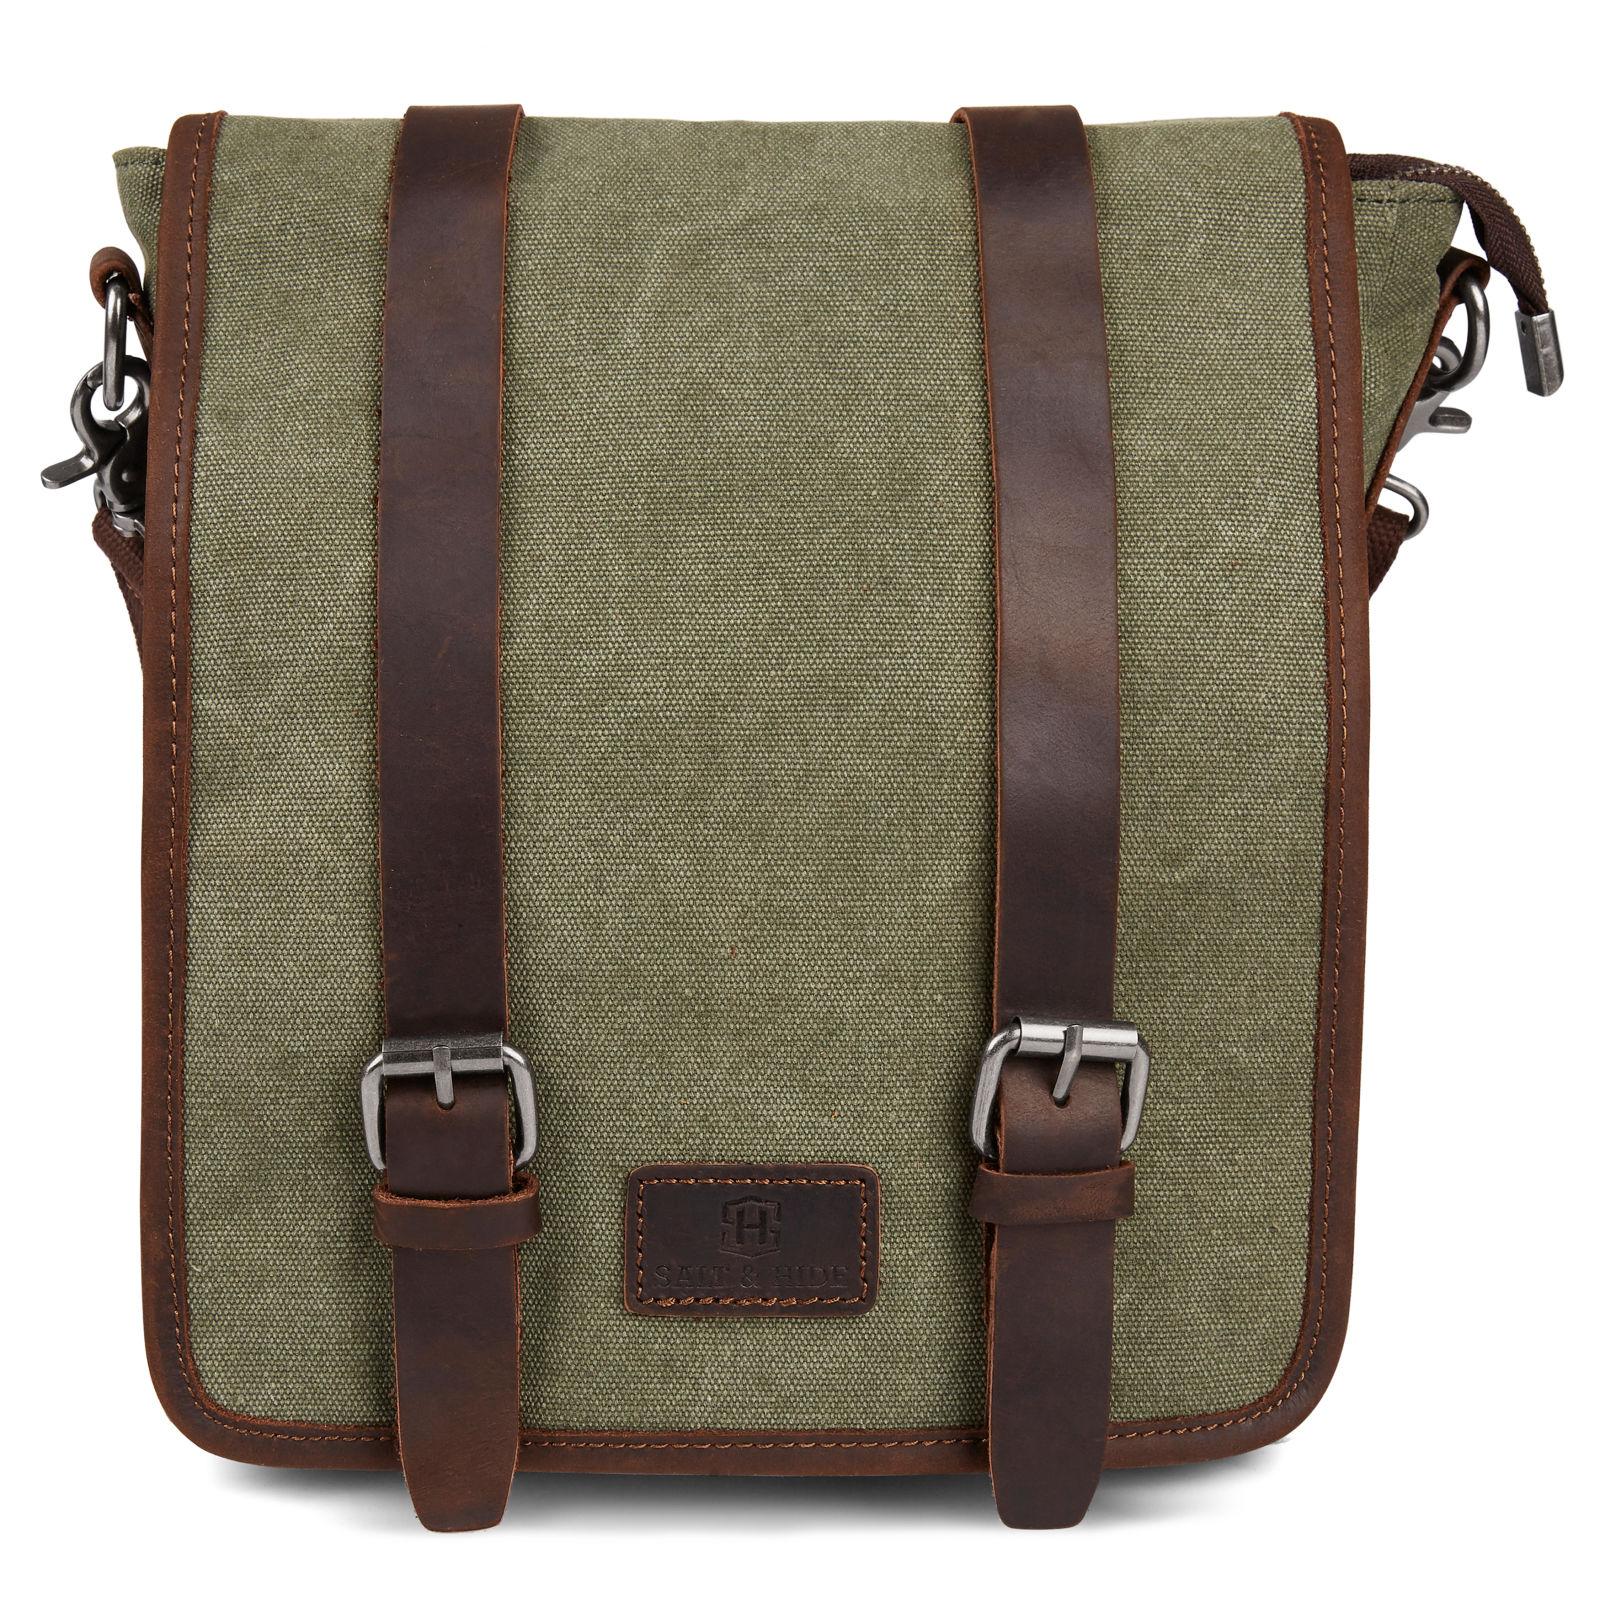 ad025f160ba Τσάντα Ταχυδρόμου (Messenger Bag) Sergio Green & Brown Slim   Γρήγορη  αποστολή   Salt & Hide